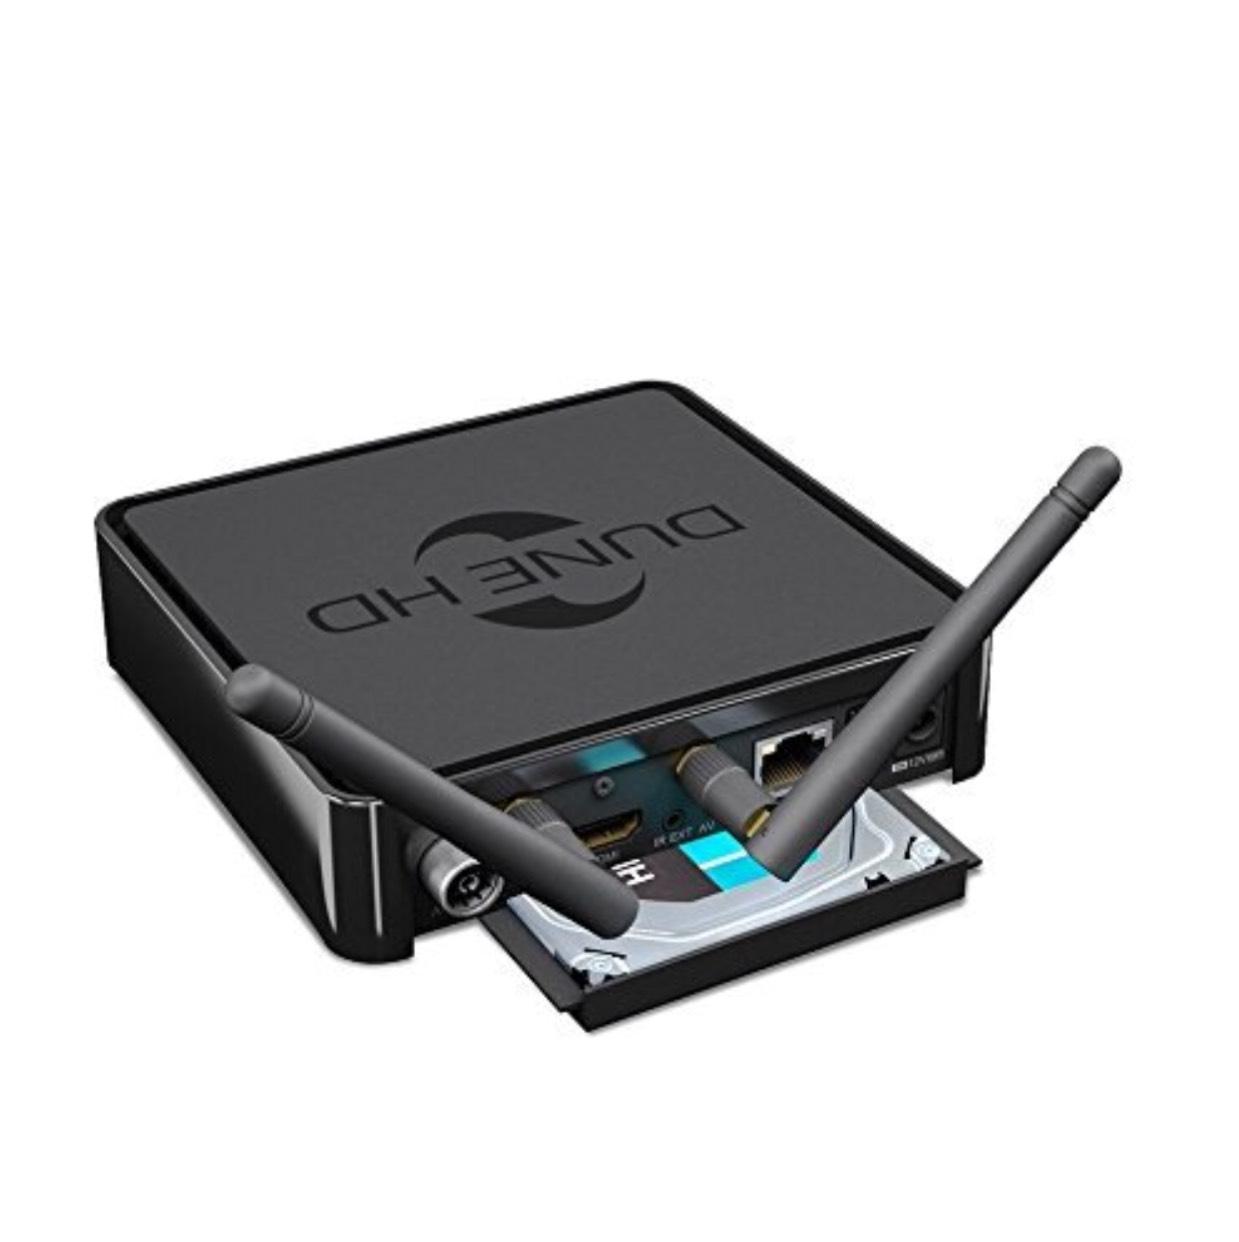 [ibood.com] Dune HD DEHDSOLO4K Solo Mediaplayer (4K, UHD, HDMI, WLAN/LAN, 3D, DVB-T/T-2/-C, IPTV, USB, 6,4 cm (2,5 Zoll) Festplatte Steckplatz)